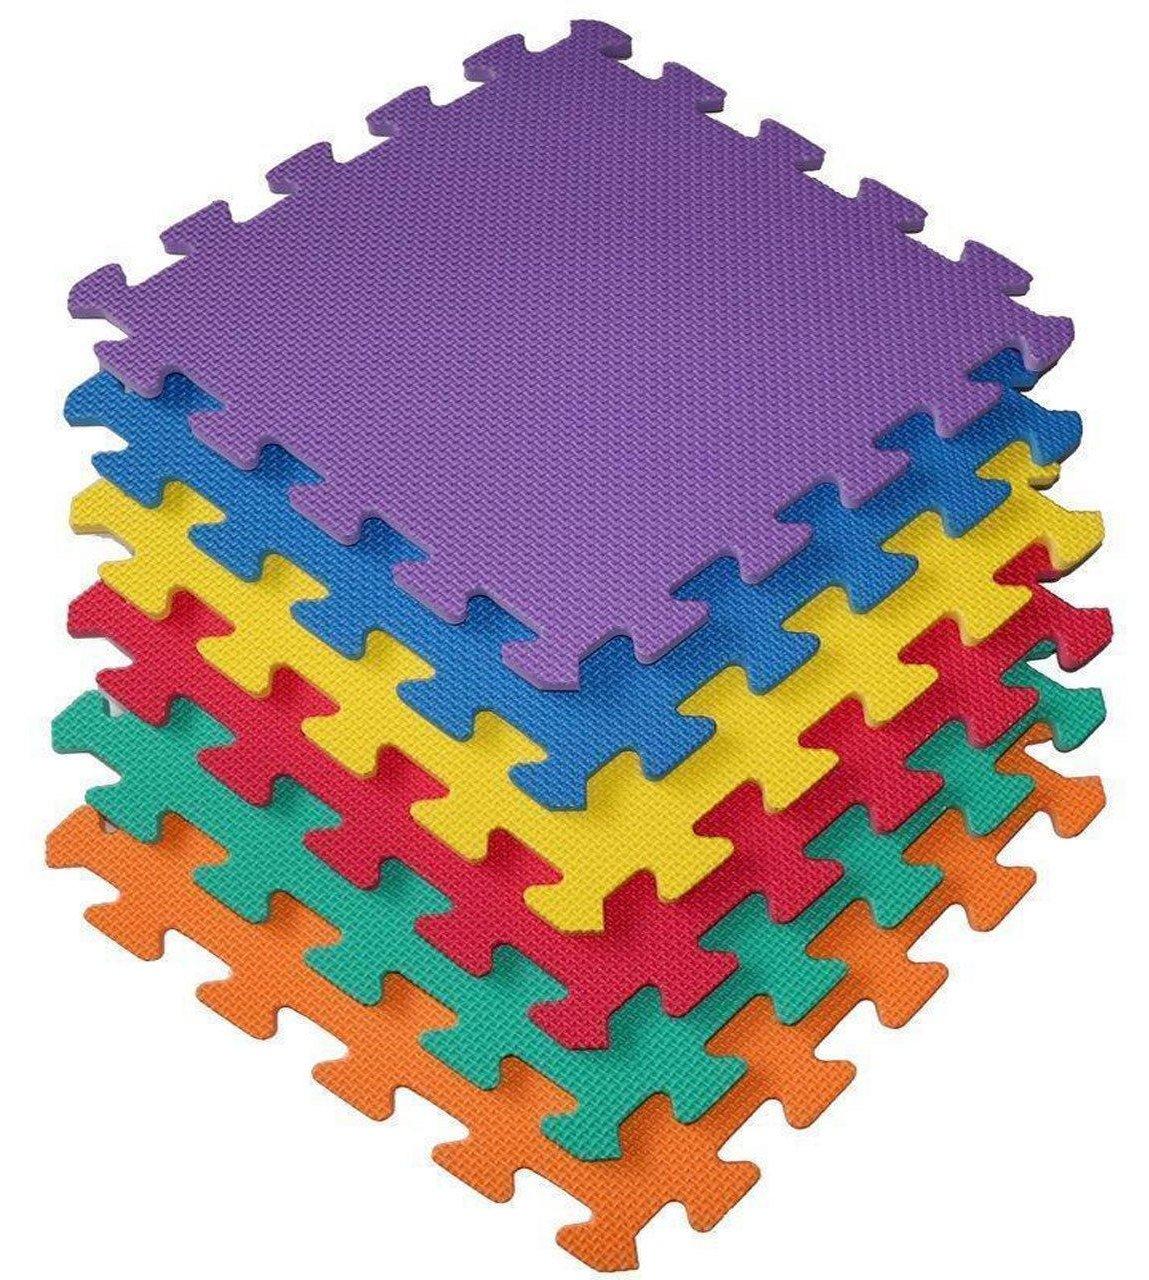 27 Piece Interlocking EVA Foam Activity Play Kids Baby Soft Mat Tiles Set Quickdraw QDS-101704